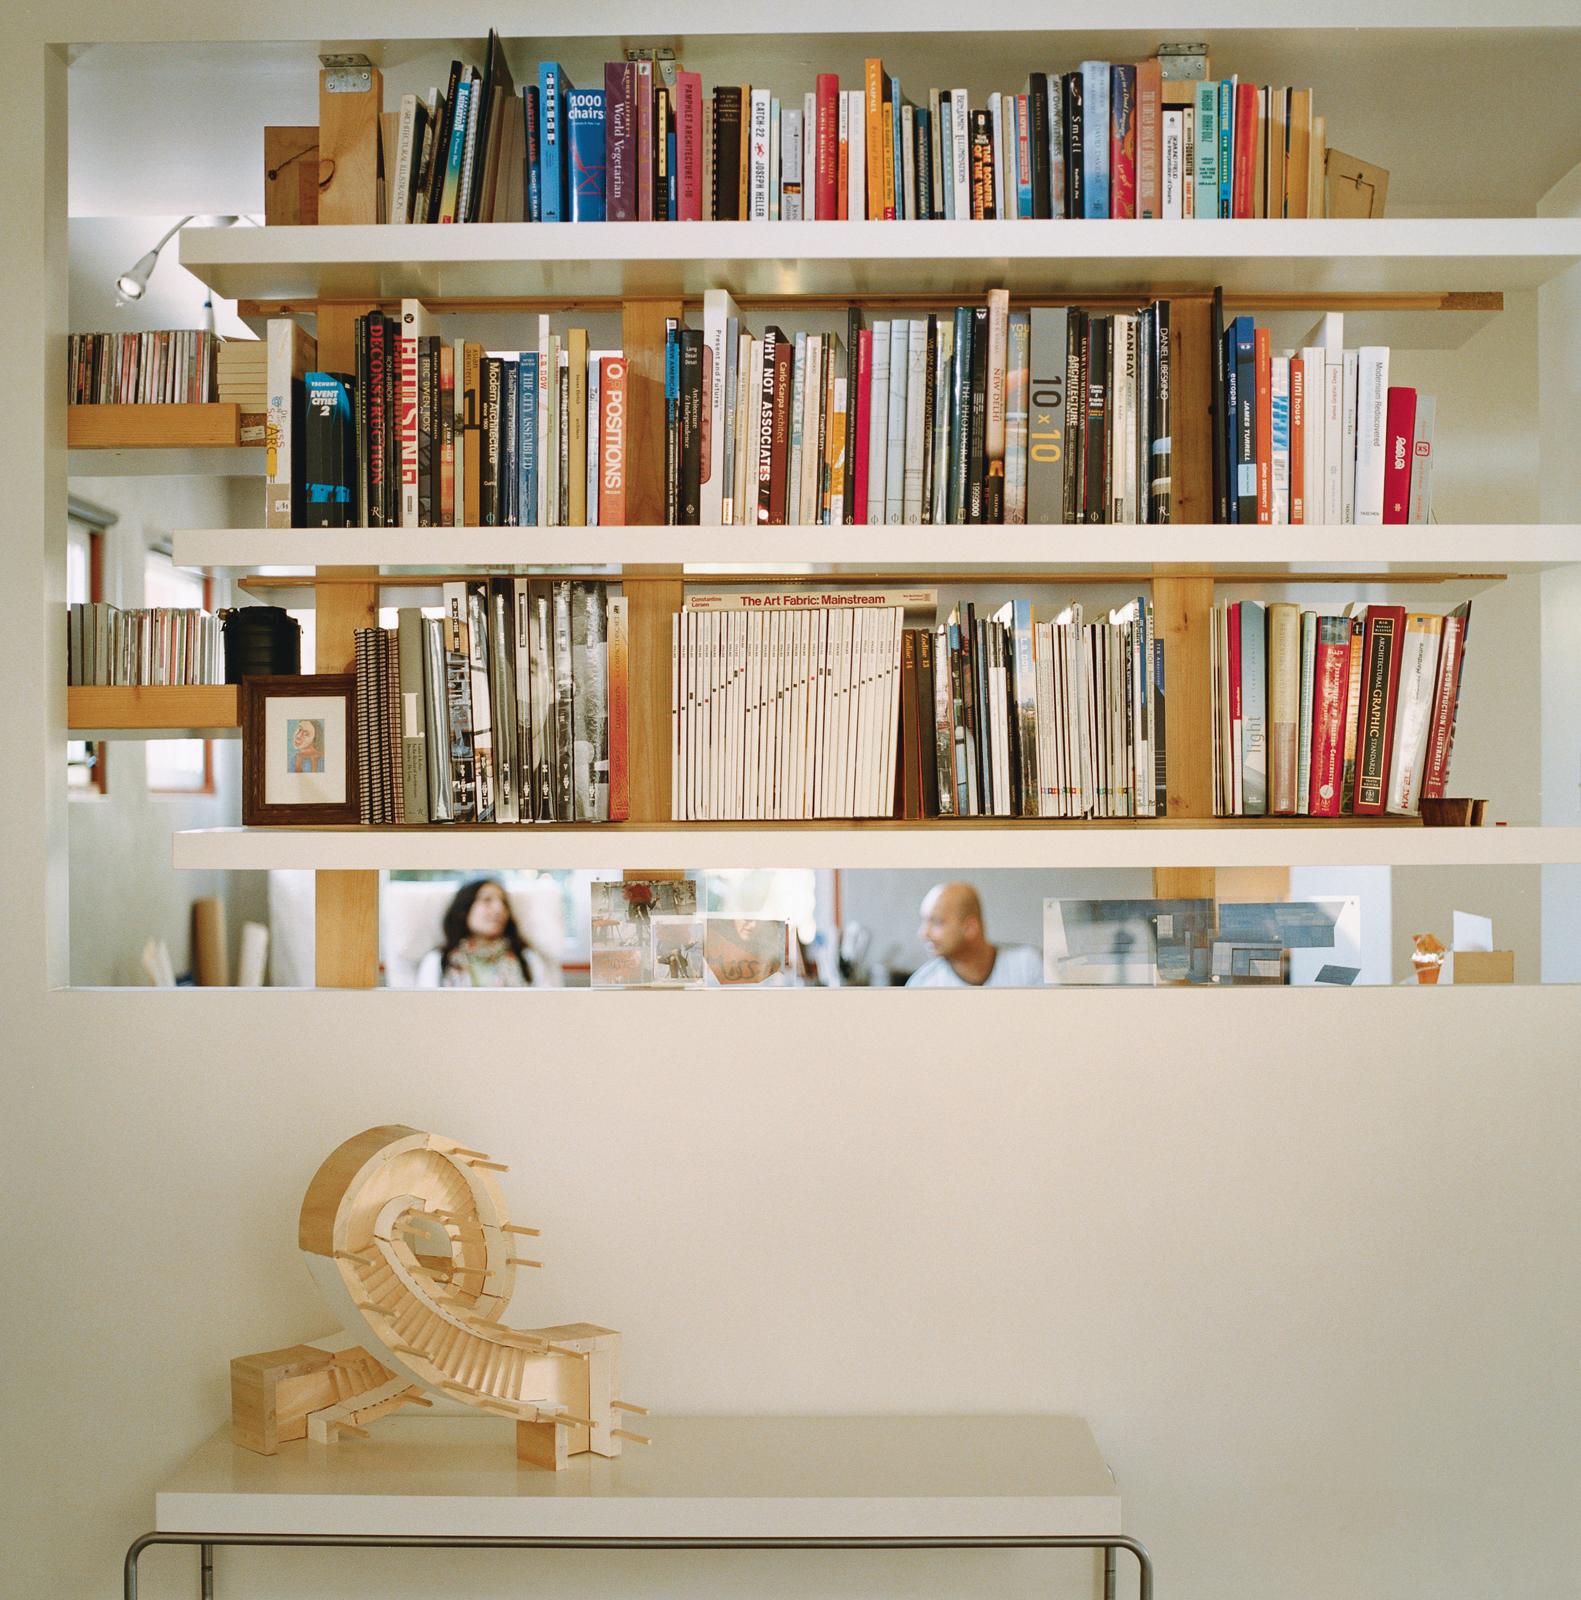 pande misra house bookshelf sculpture